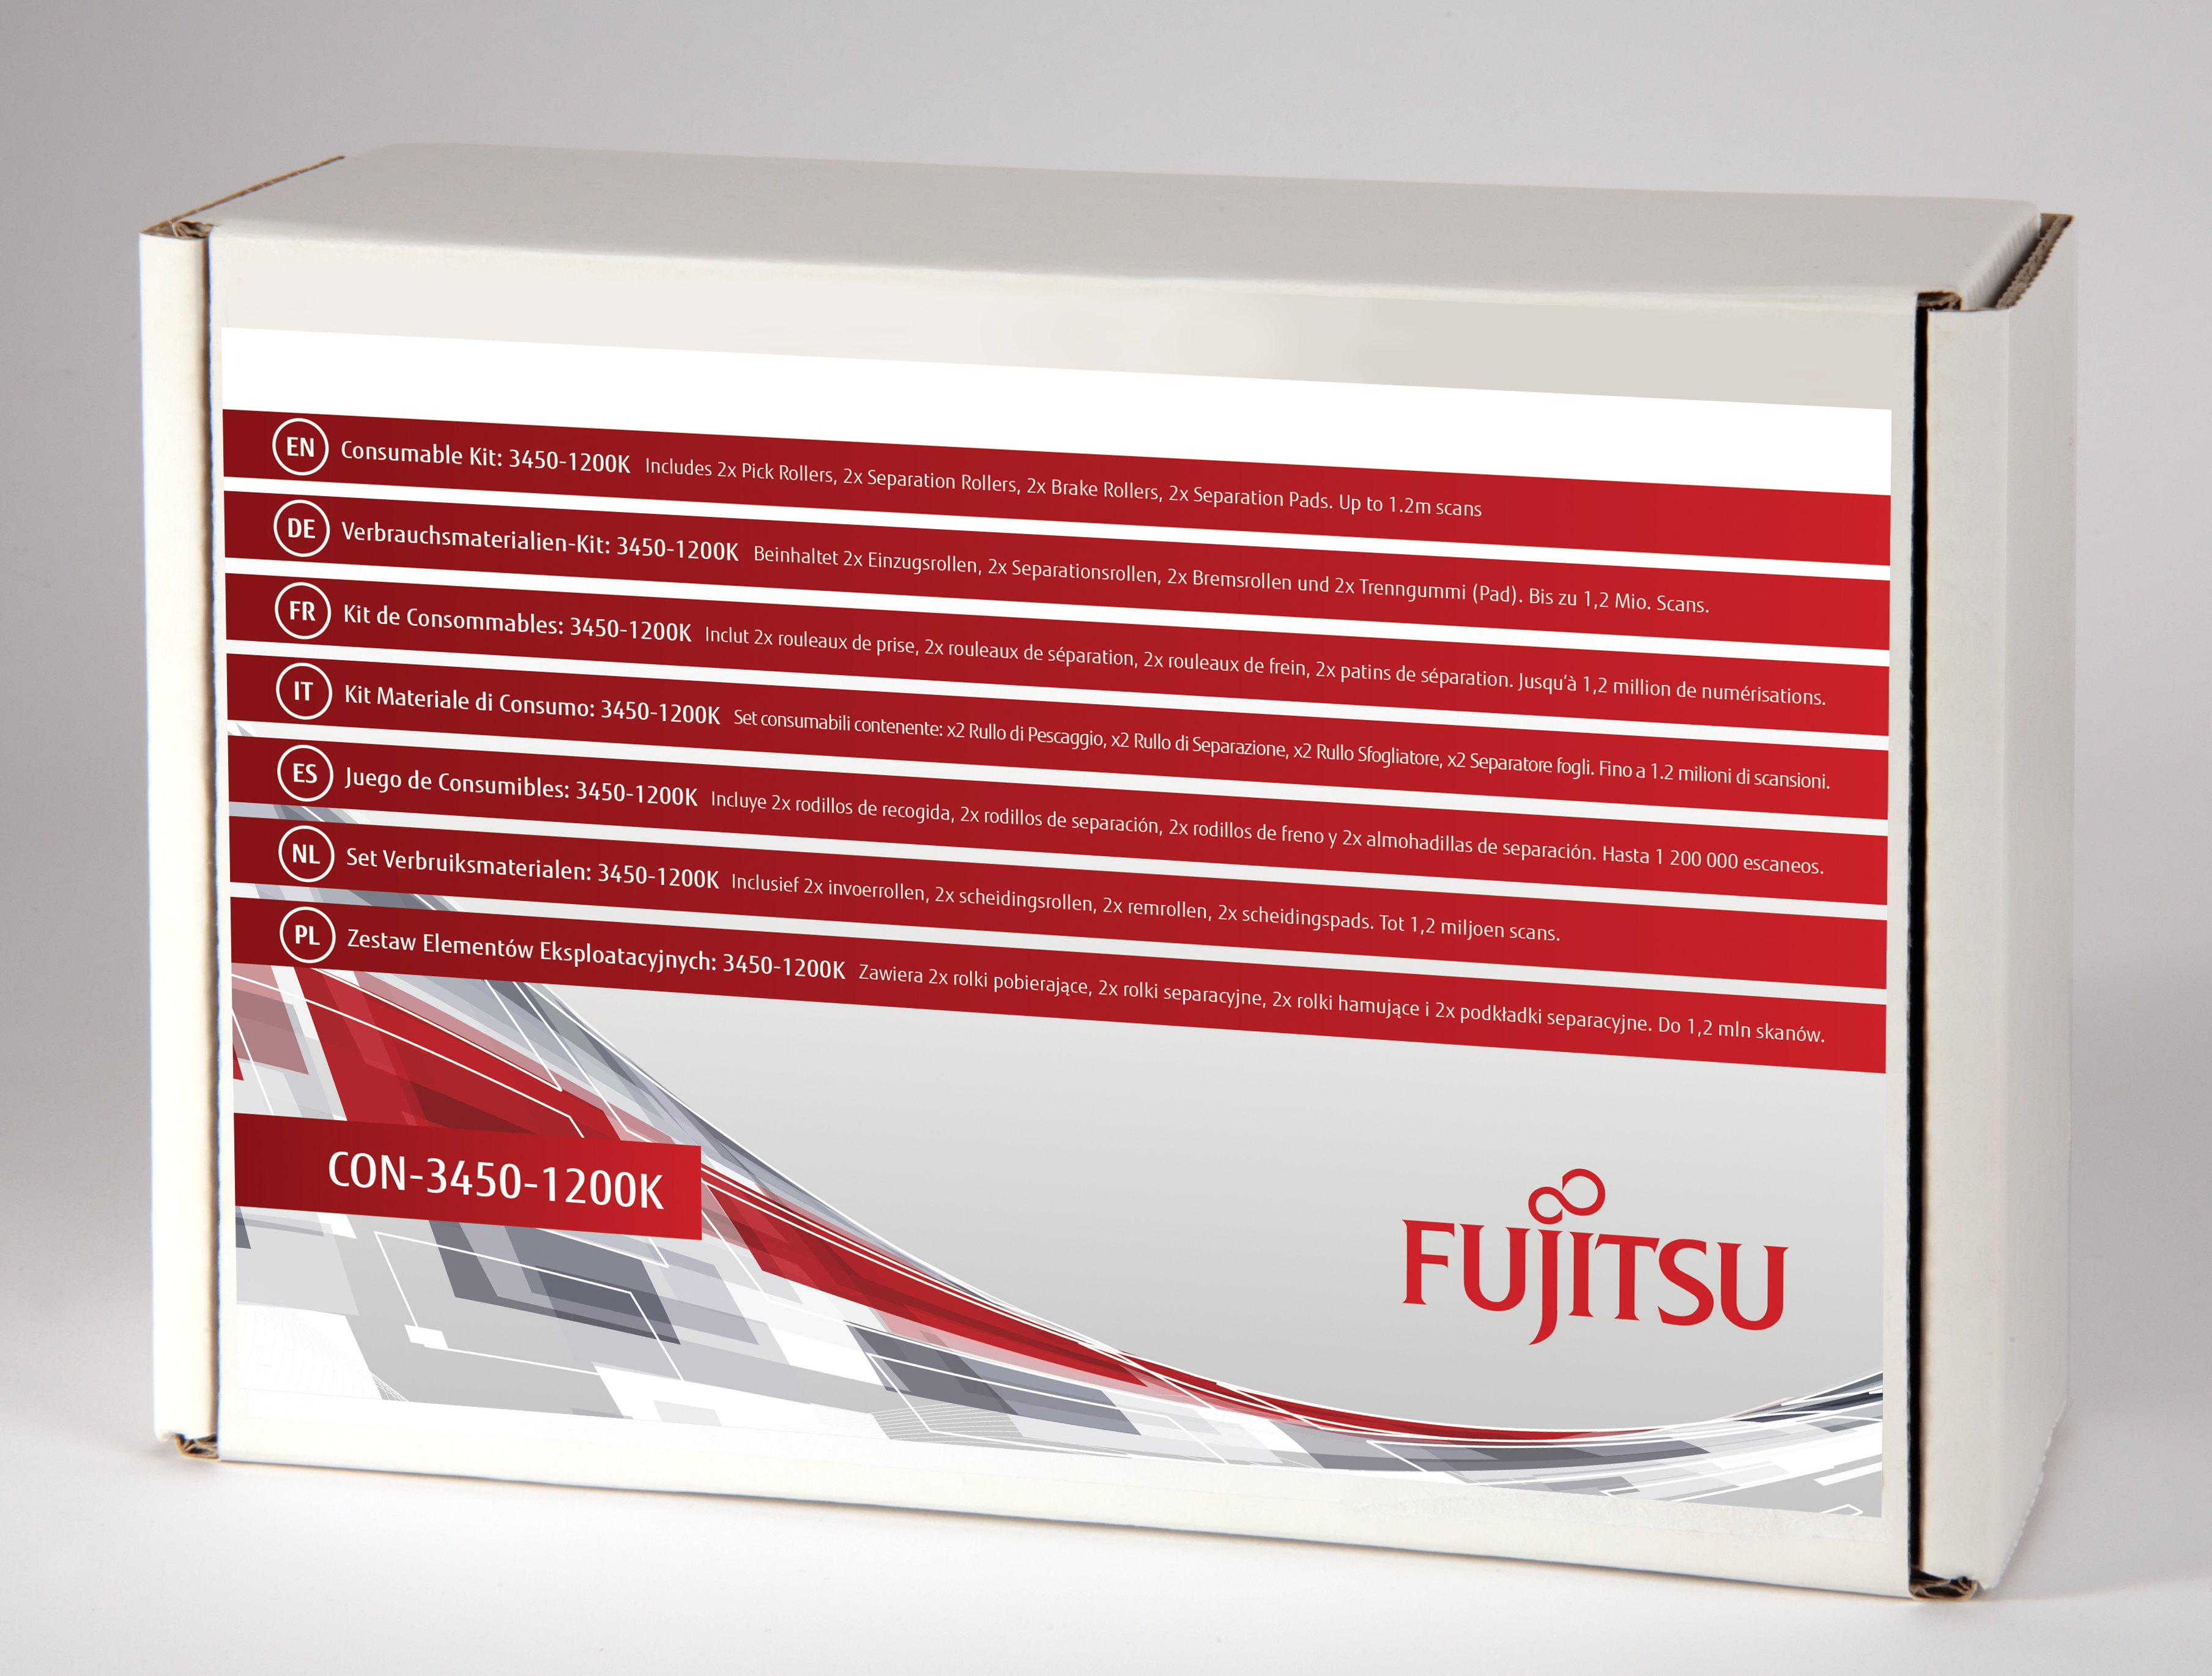 Fujitsu Consumable Kit: 3450-1200K - Scanner